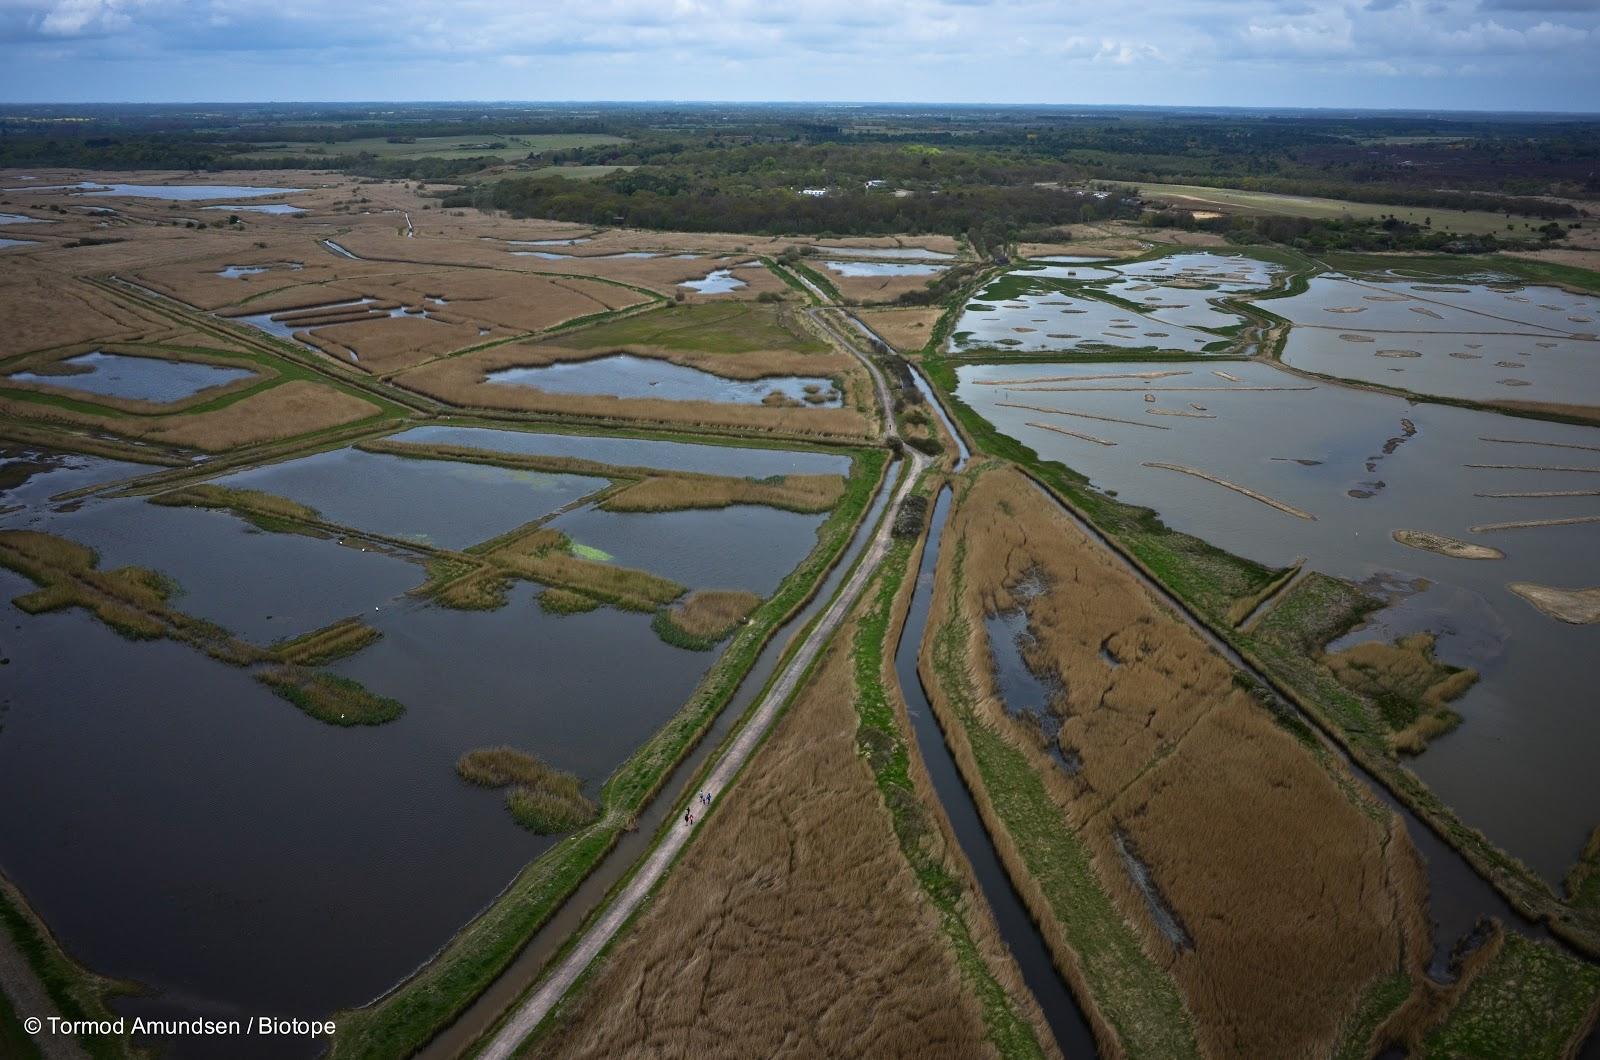 biotope: Intelligent design - the RSPB Minsmere nature reserve